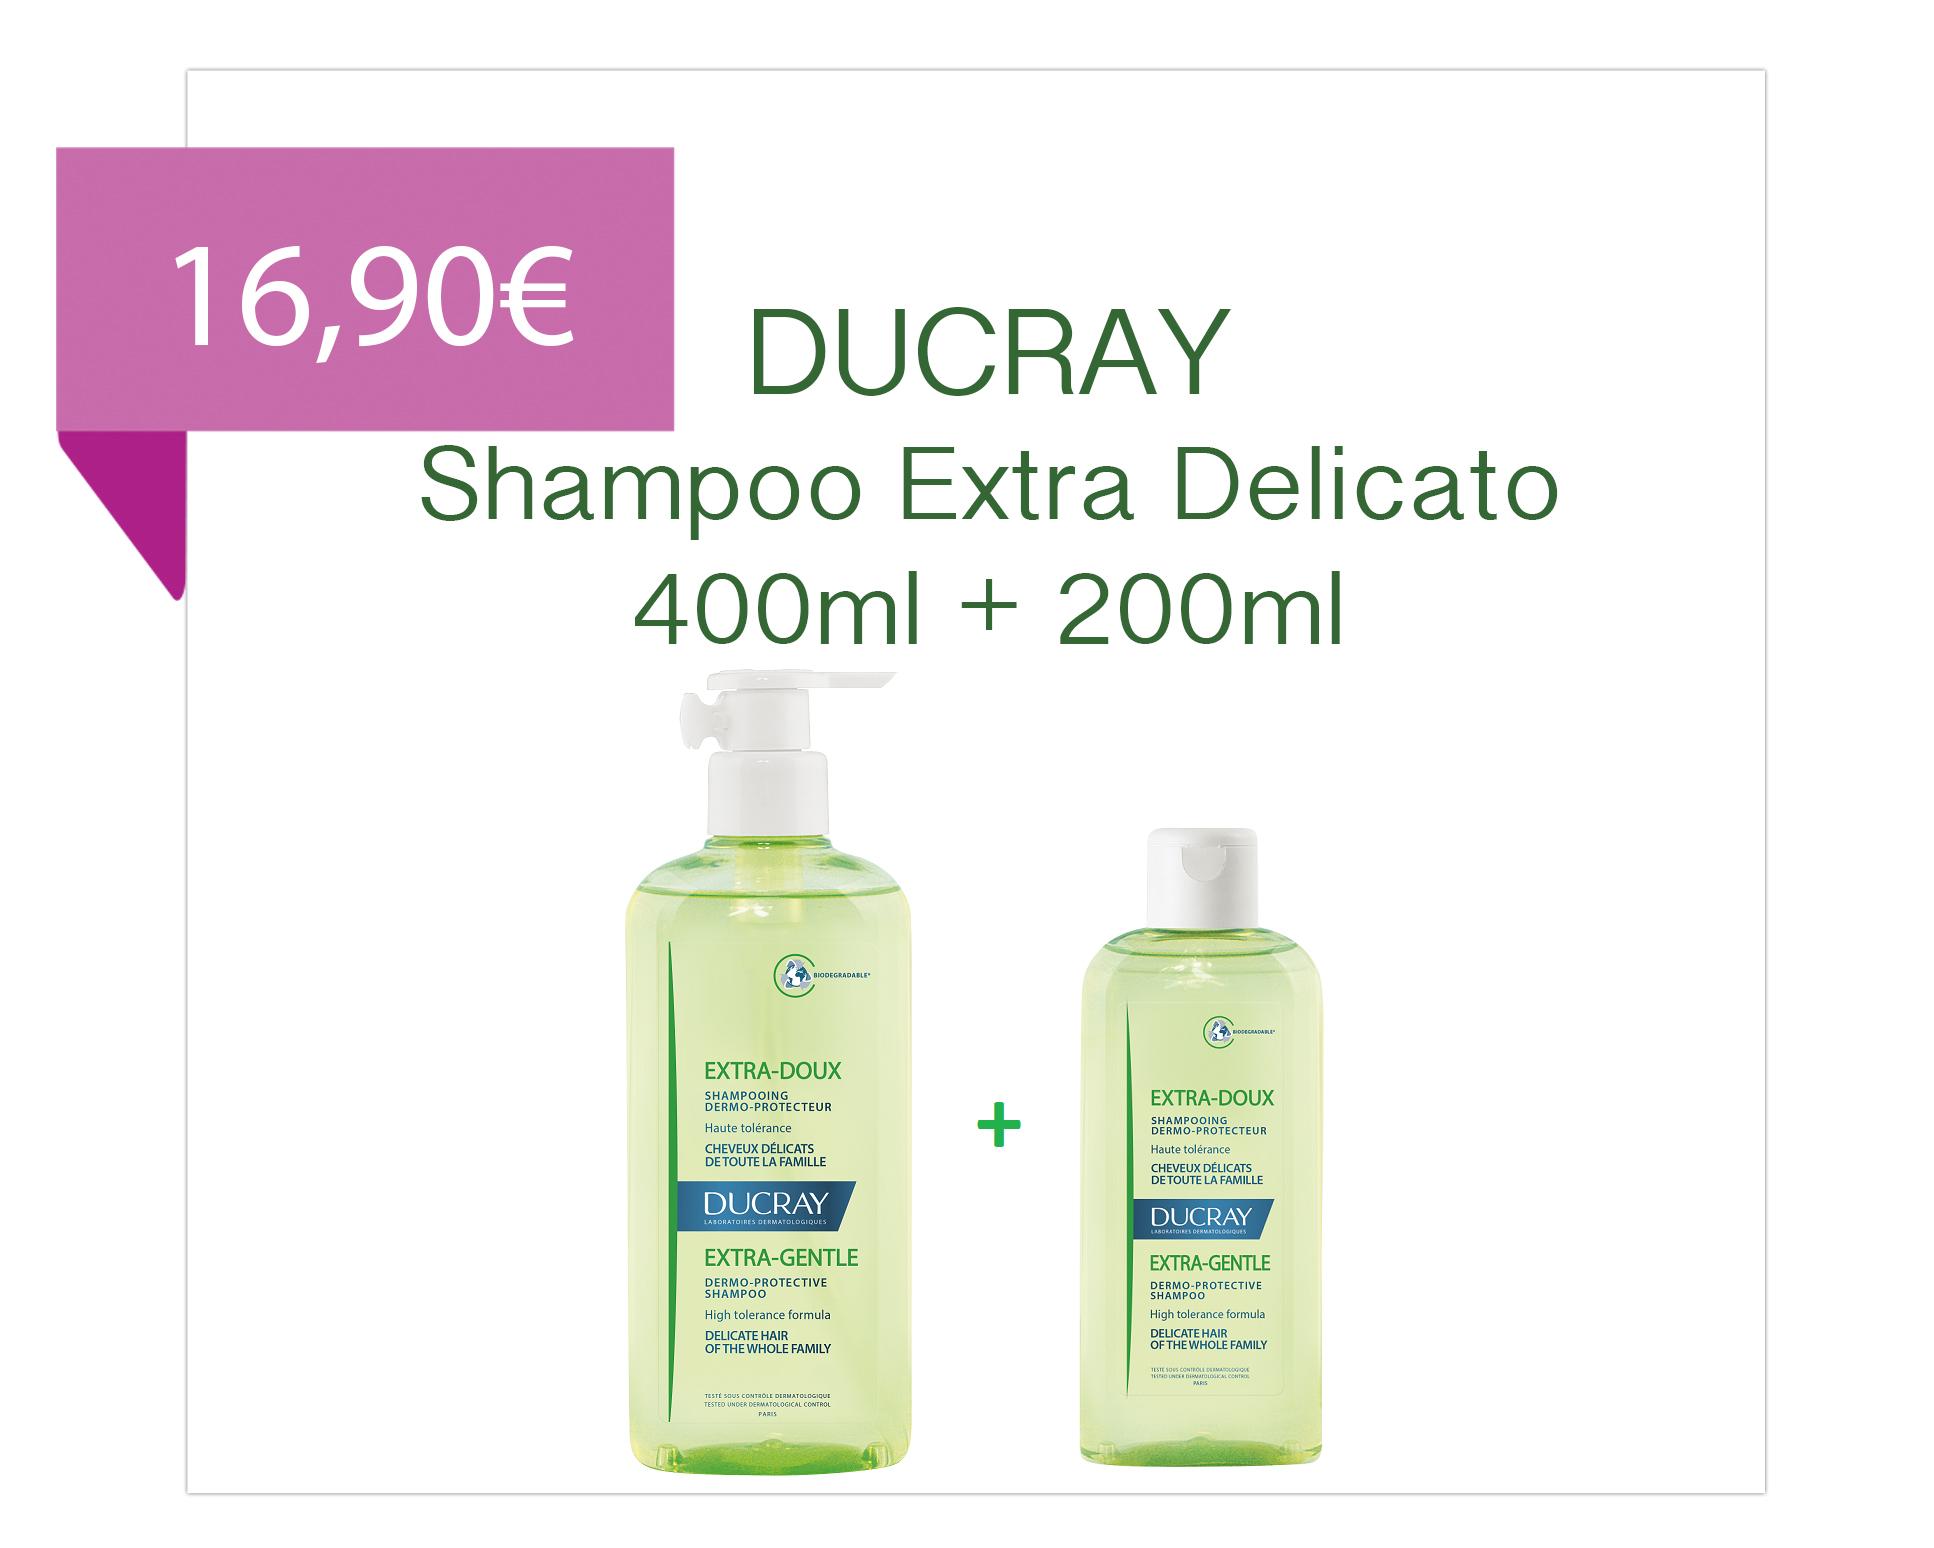 ducray extra